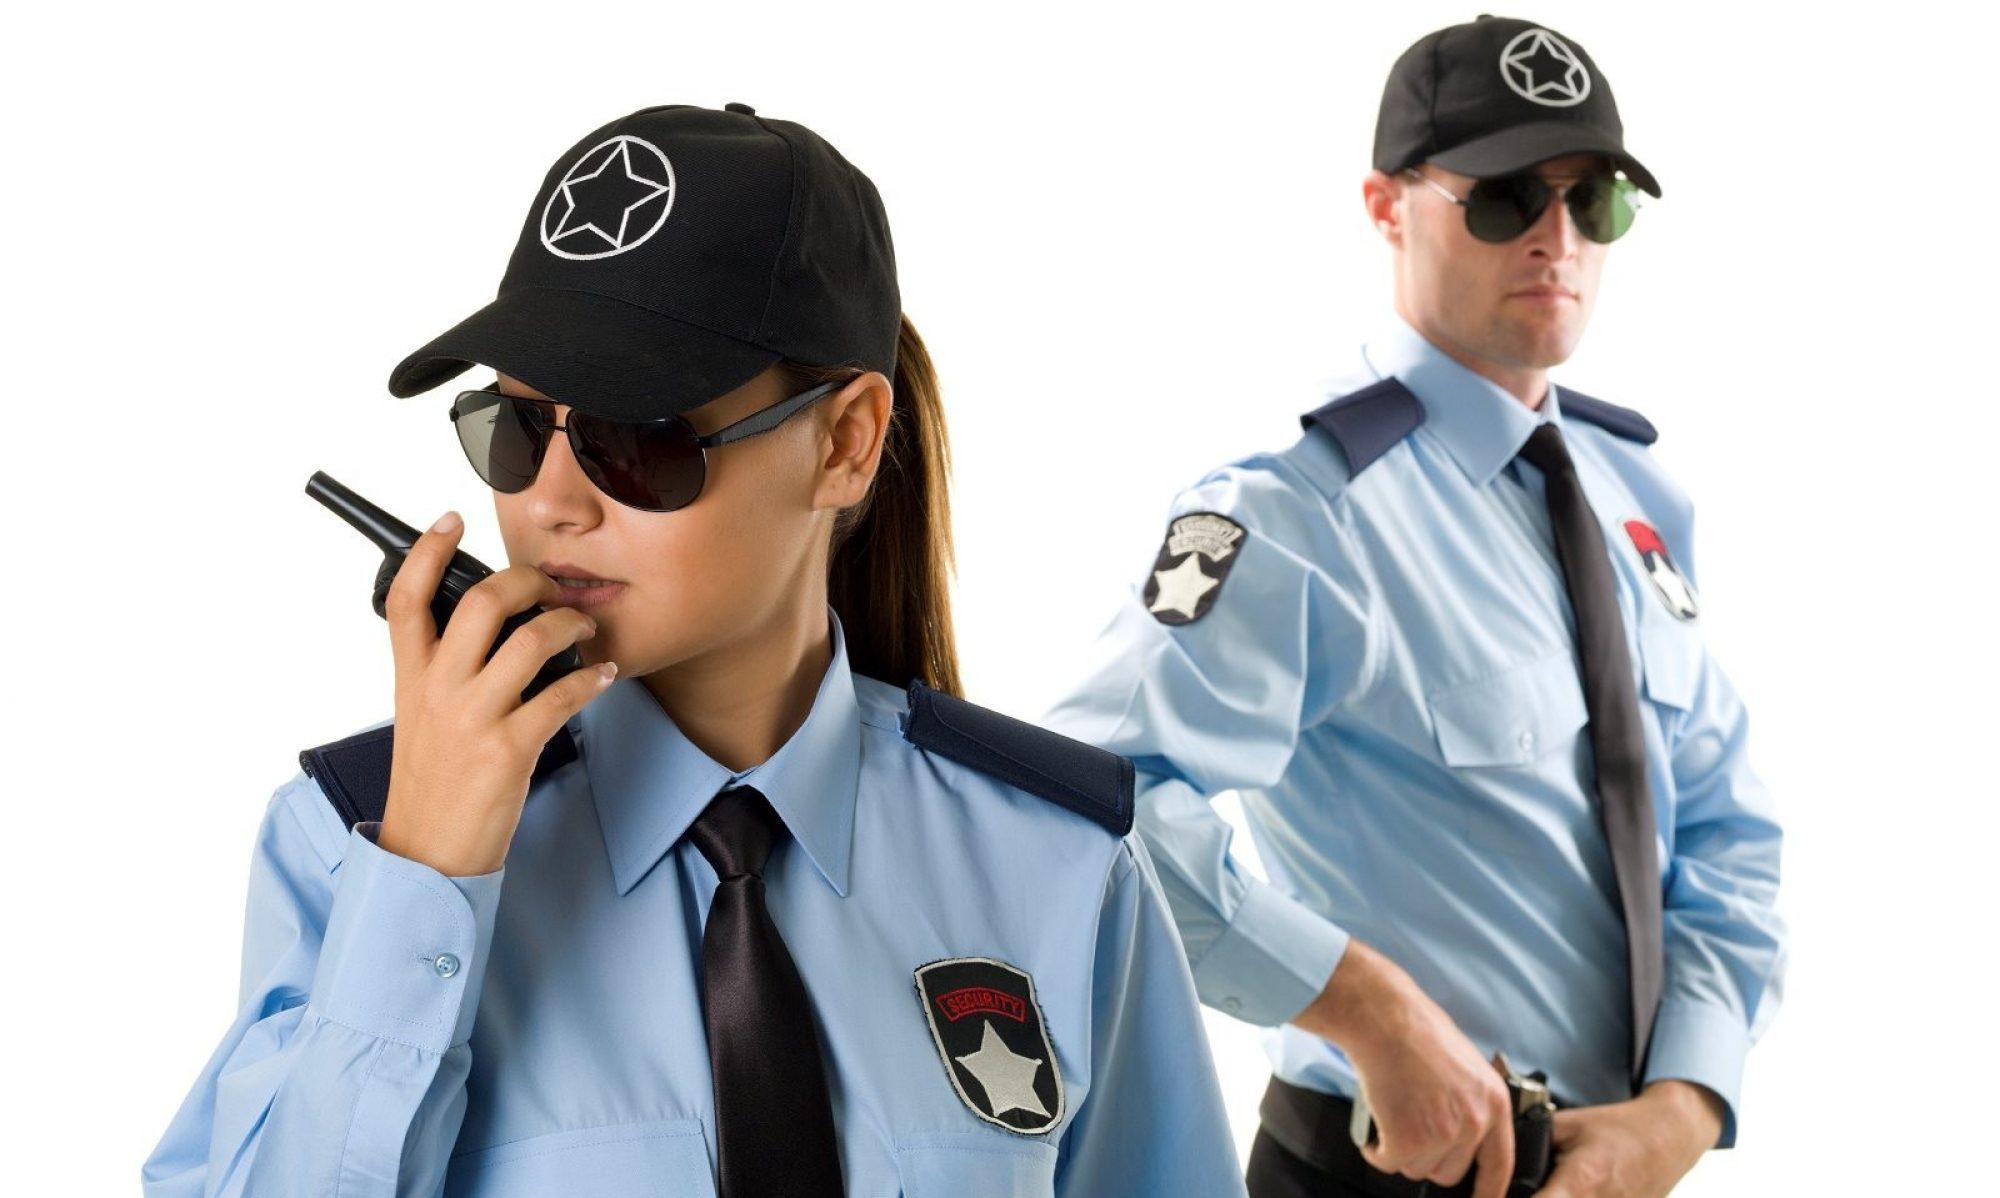 SAS Security Services